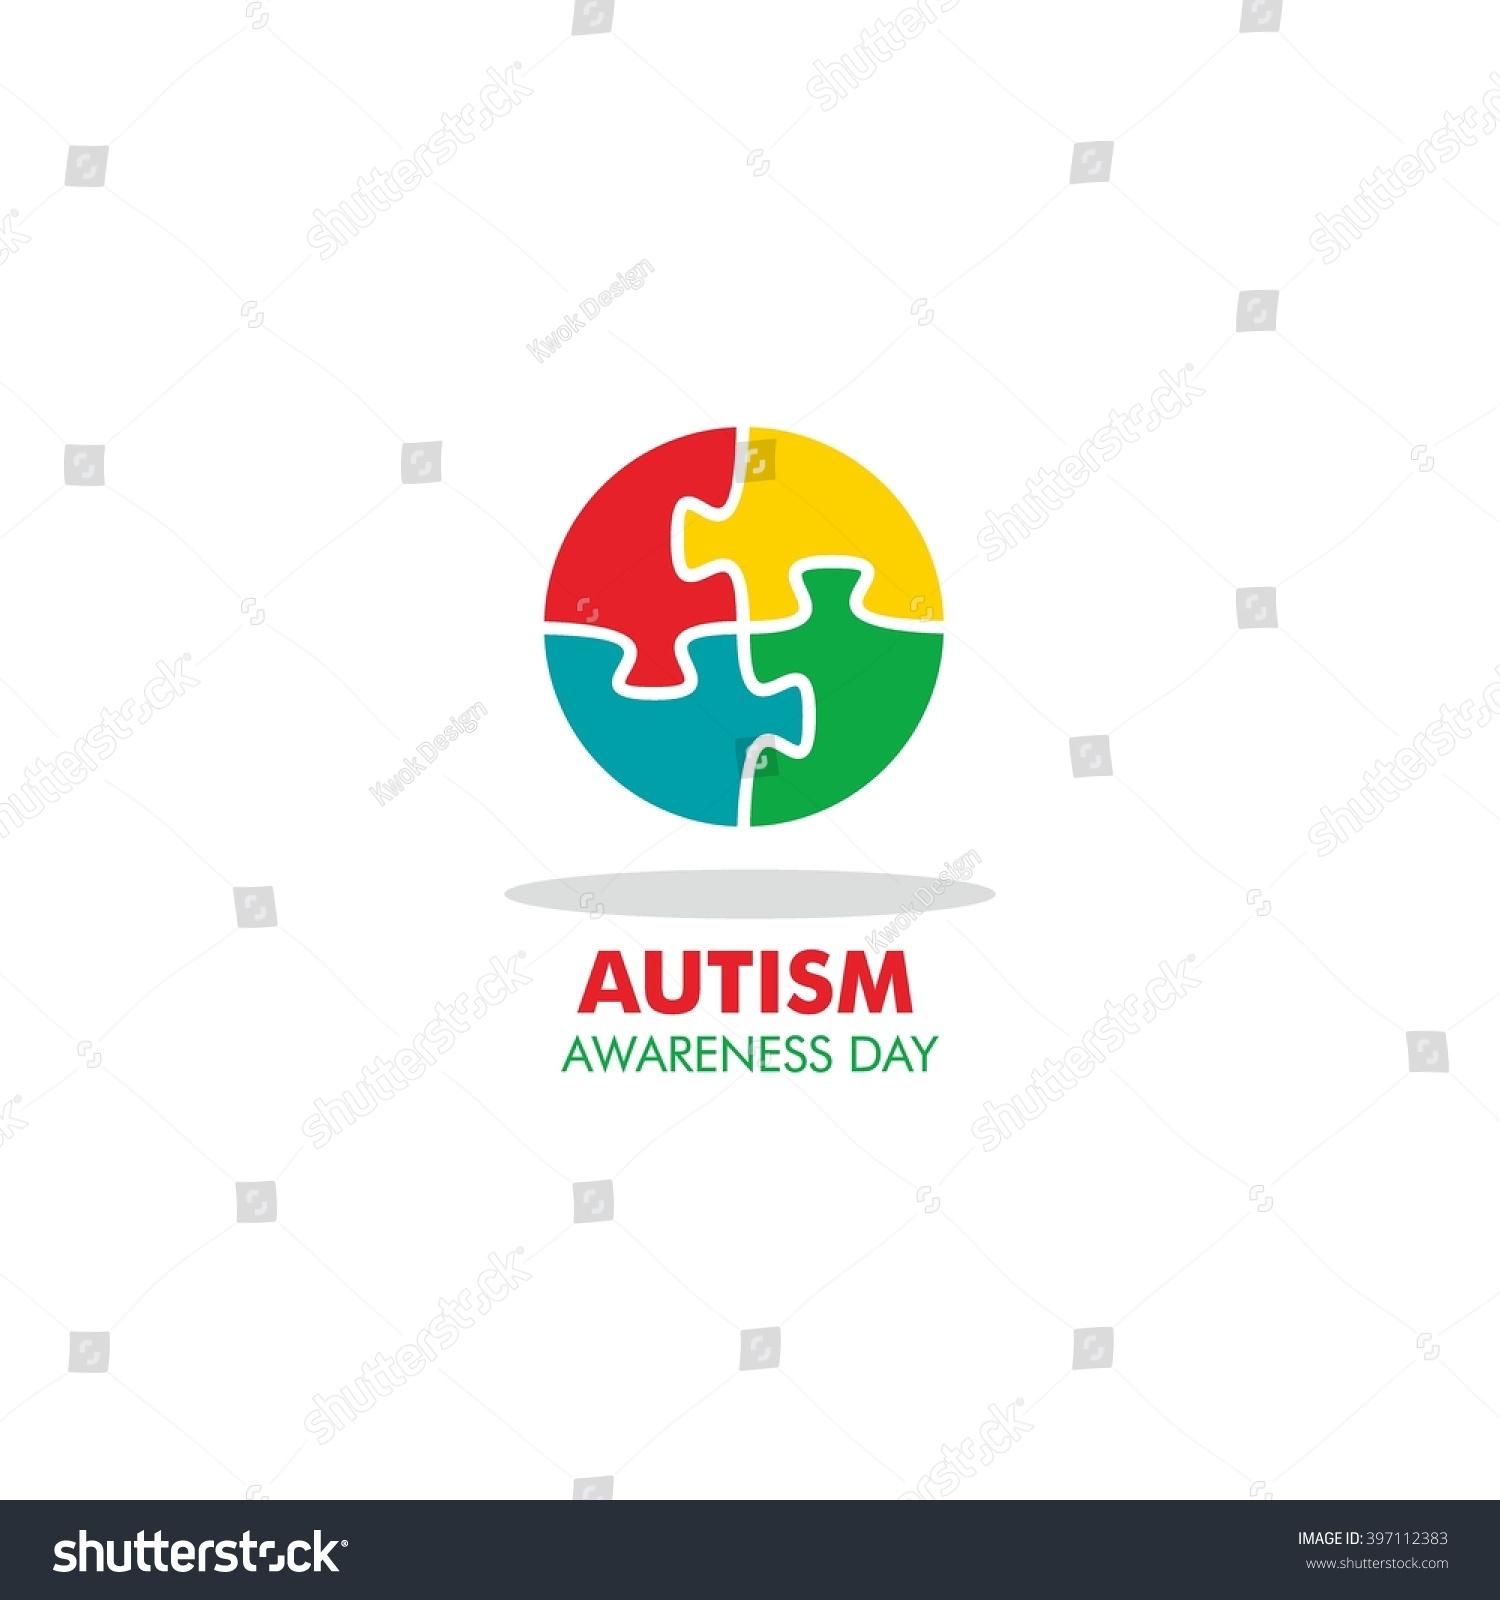 World autism awareness day logo design stock vector 397112383 world autism awareness day logo design template vector illustration colorful puzzles symbol biocorpaavc